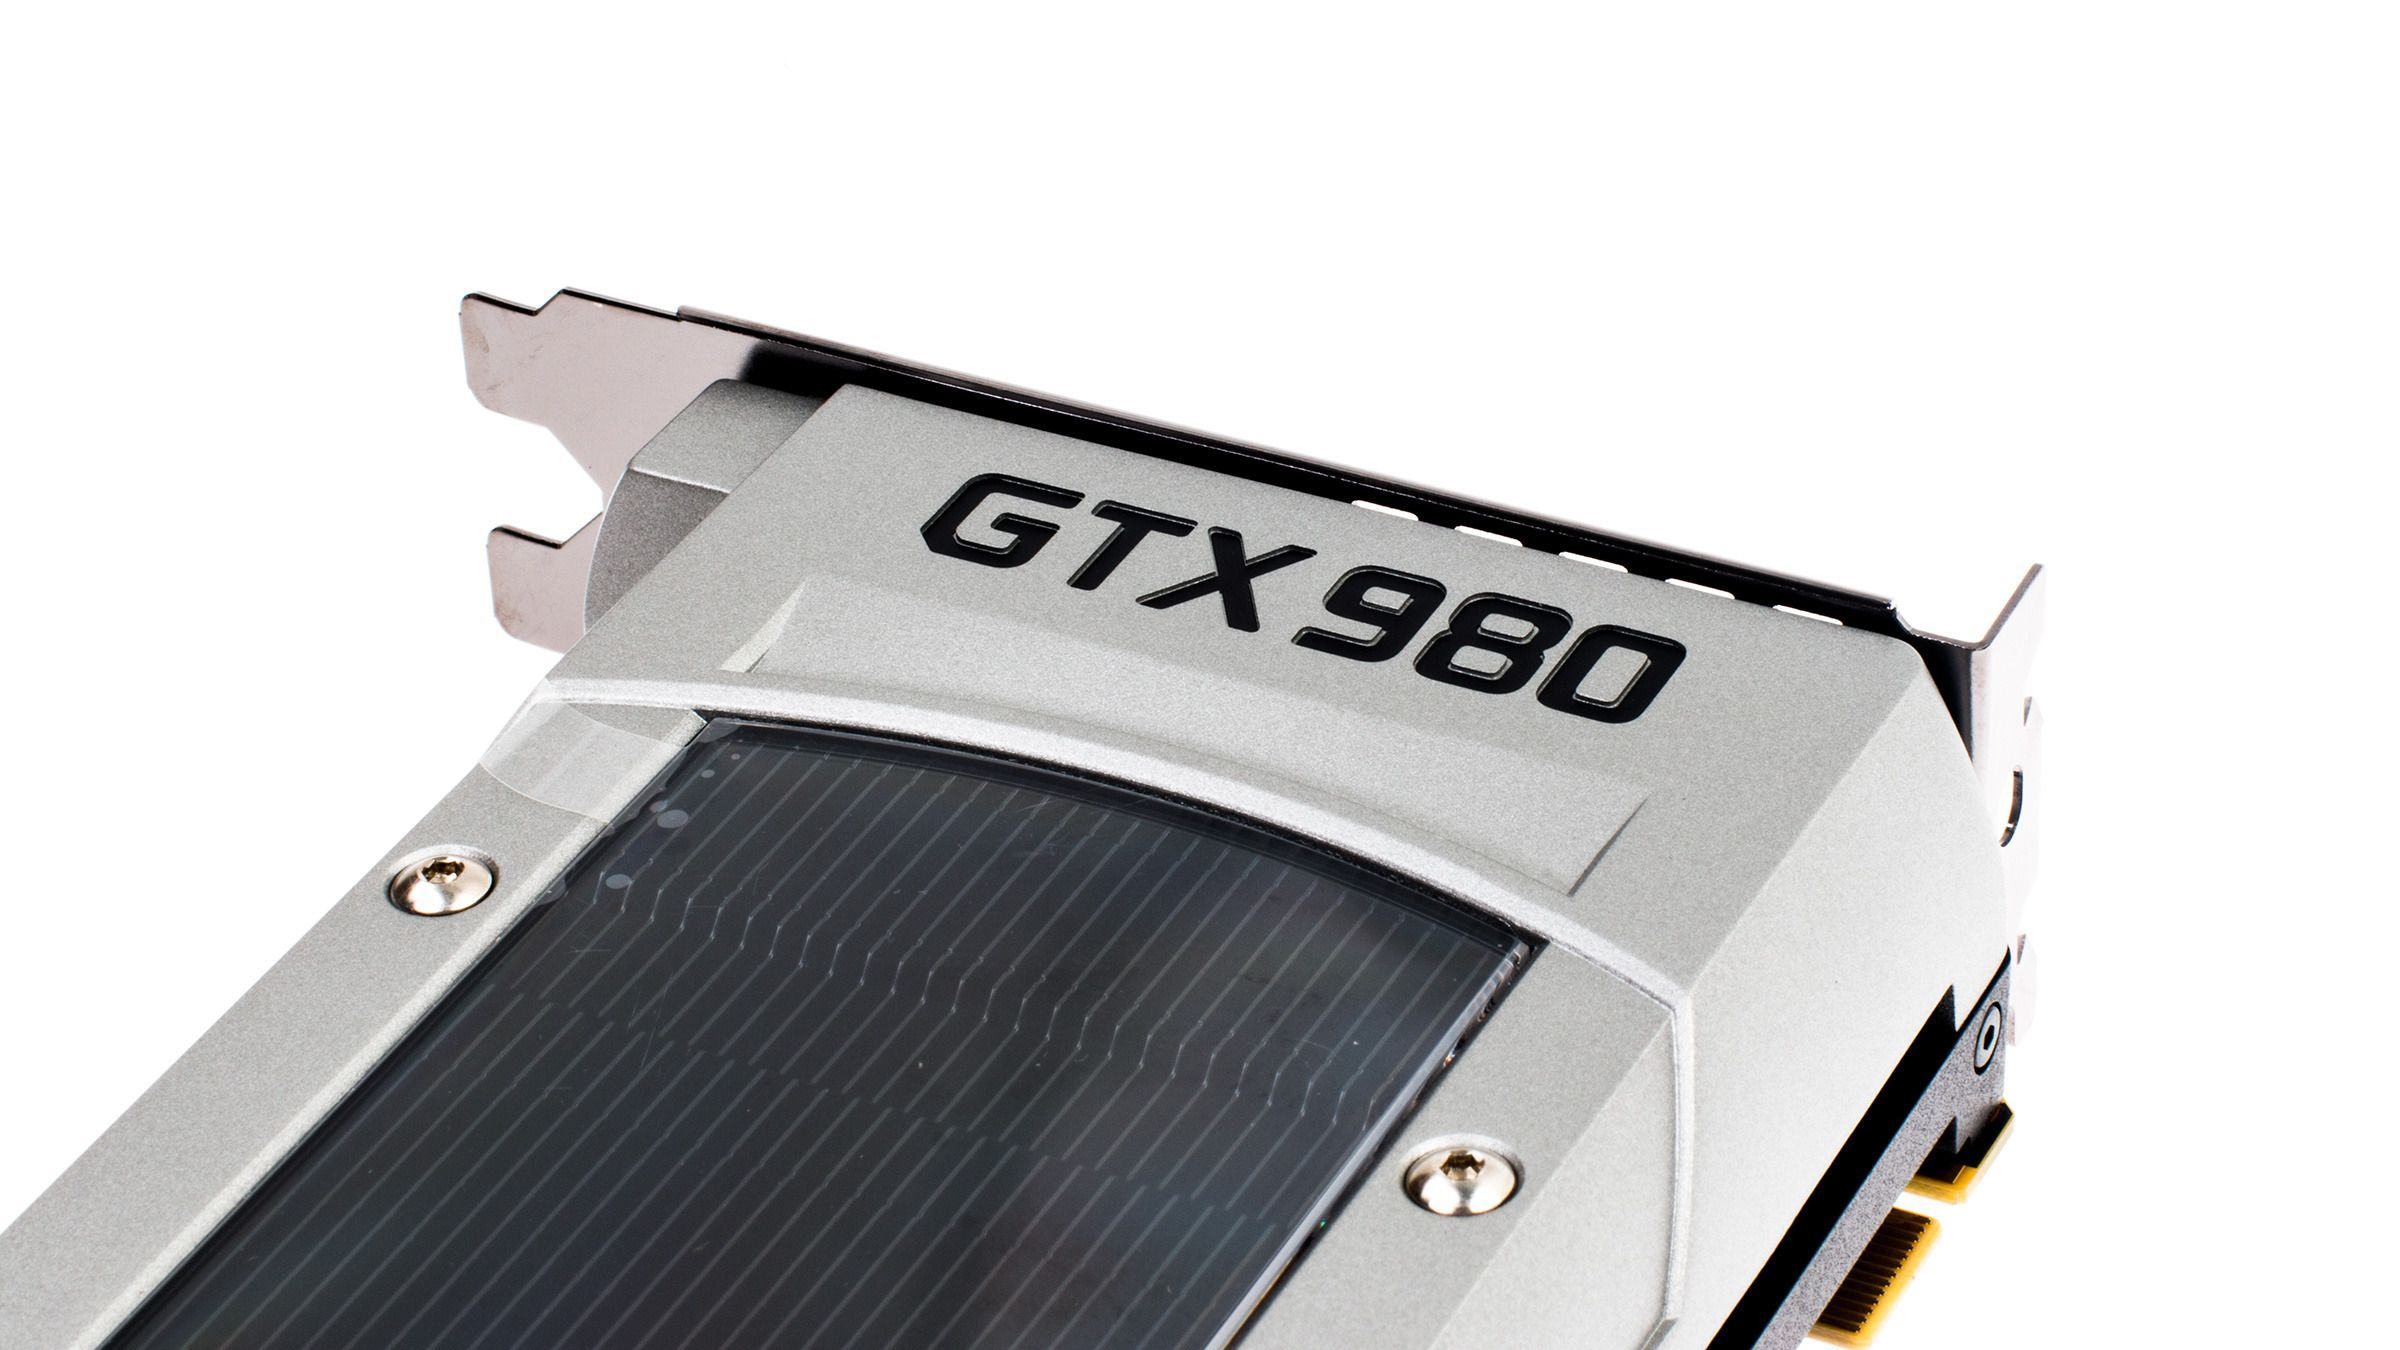 Nvidia GeForce GTX 980.Foto: Varg Aamo, Tek.no